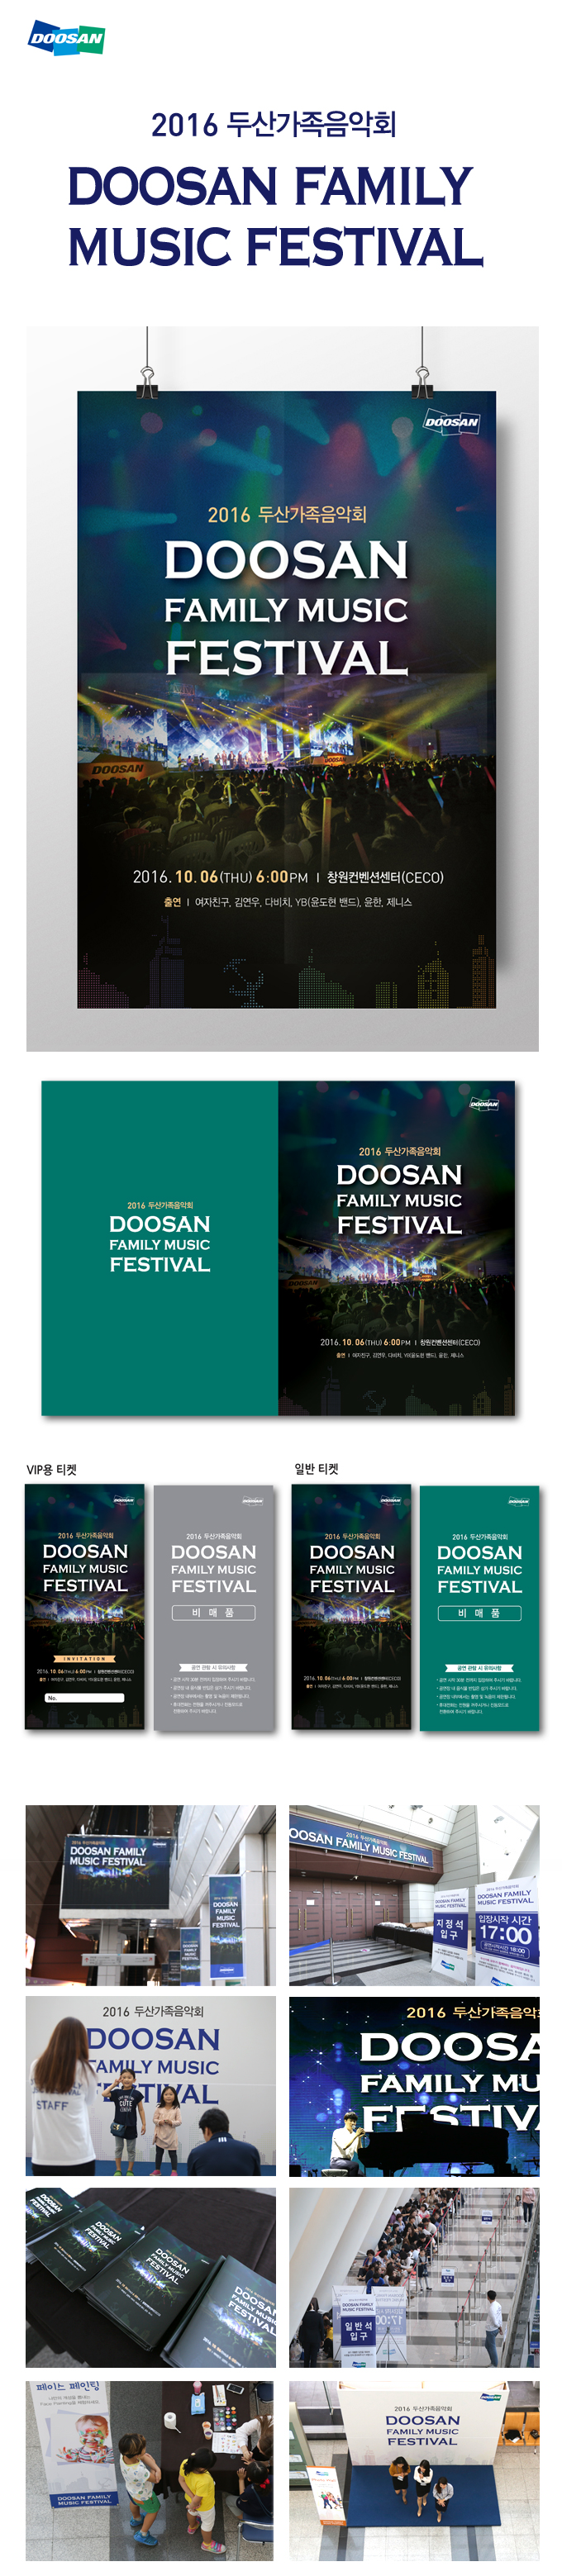 2016-doosan-family